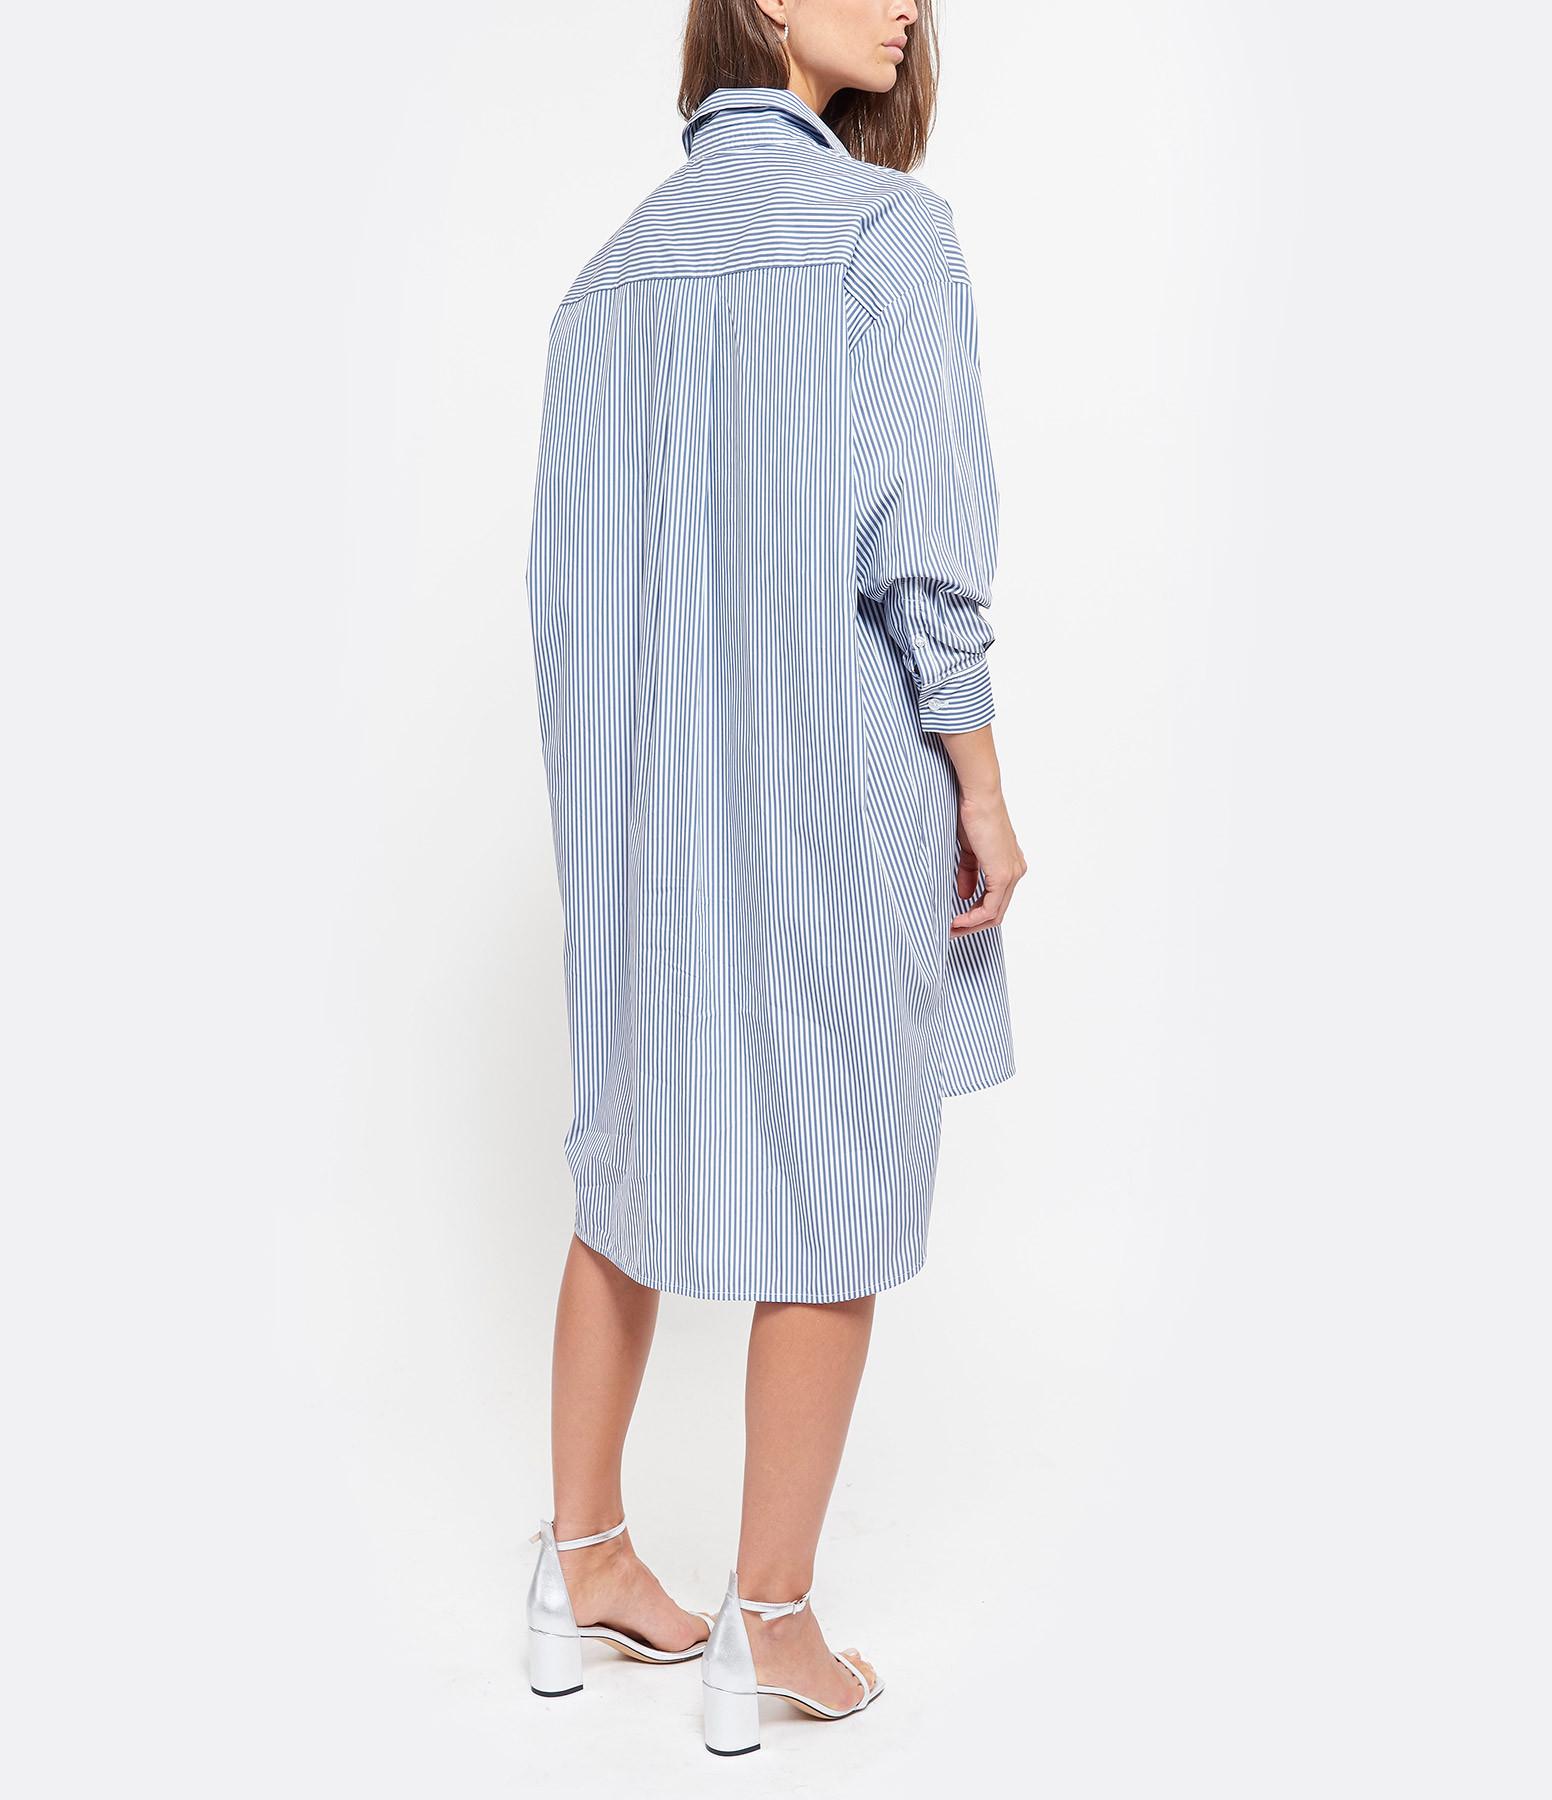 JEANNE VOULAND - Robe Chemise Dakota Rayée Bleu Blanc